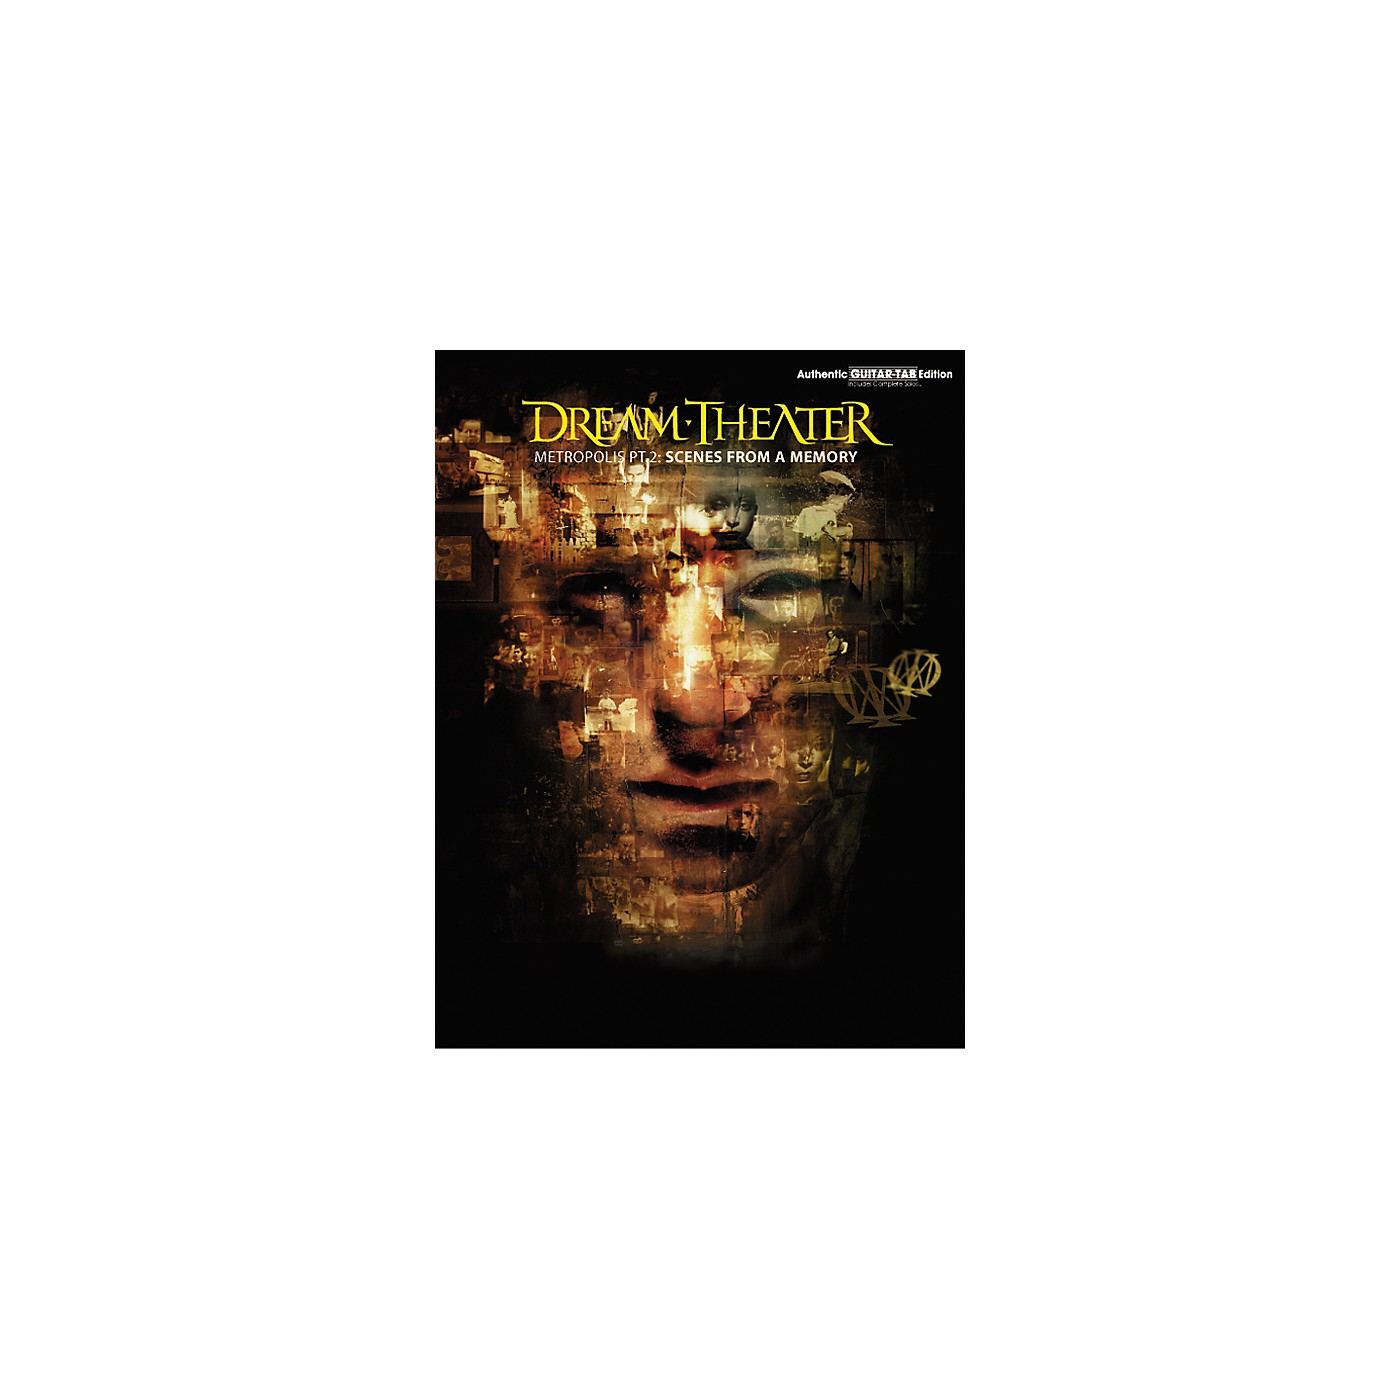 Hal Leonard Dream Theater Metropolis Part 2 Scenes from a Memory Guitar Tab Book thumbnail